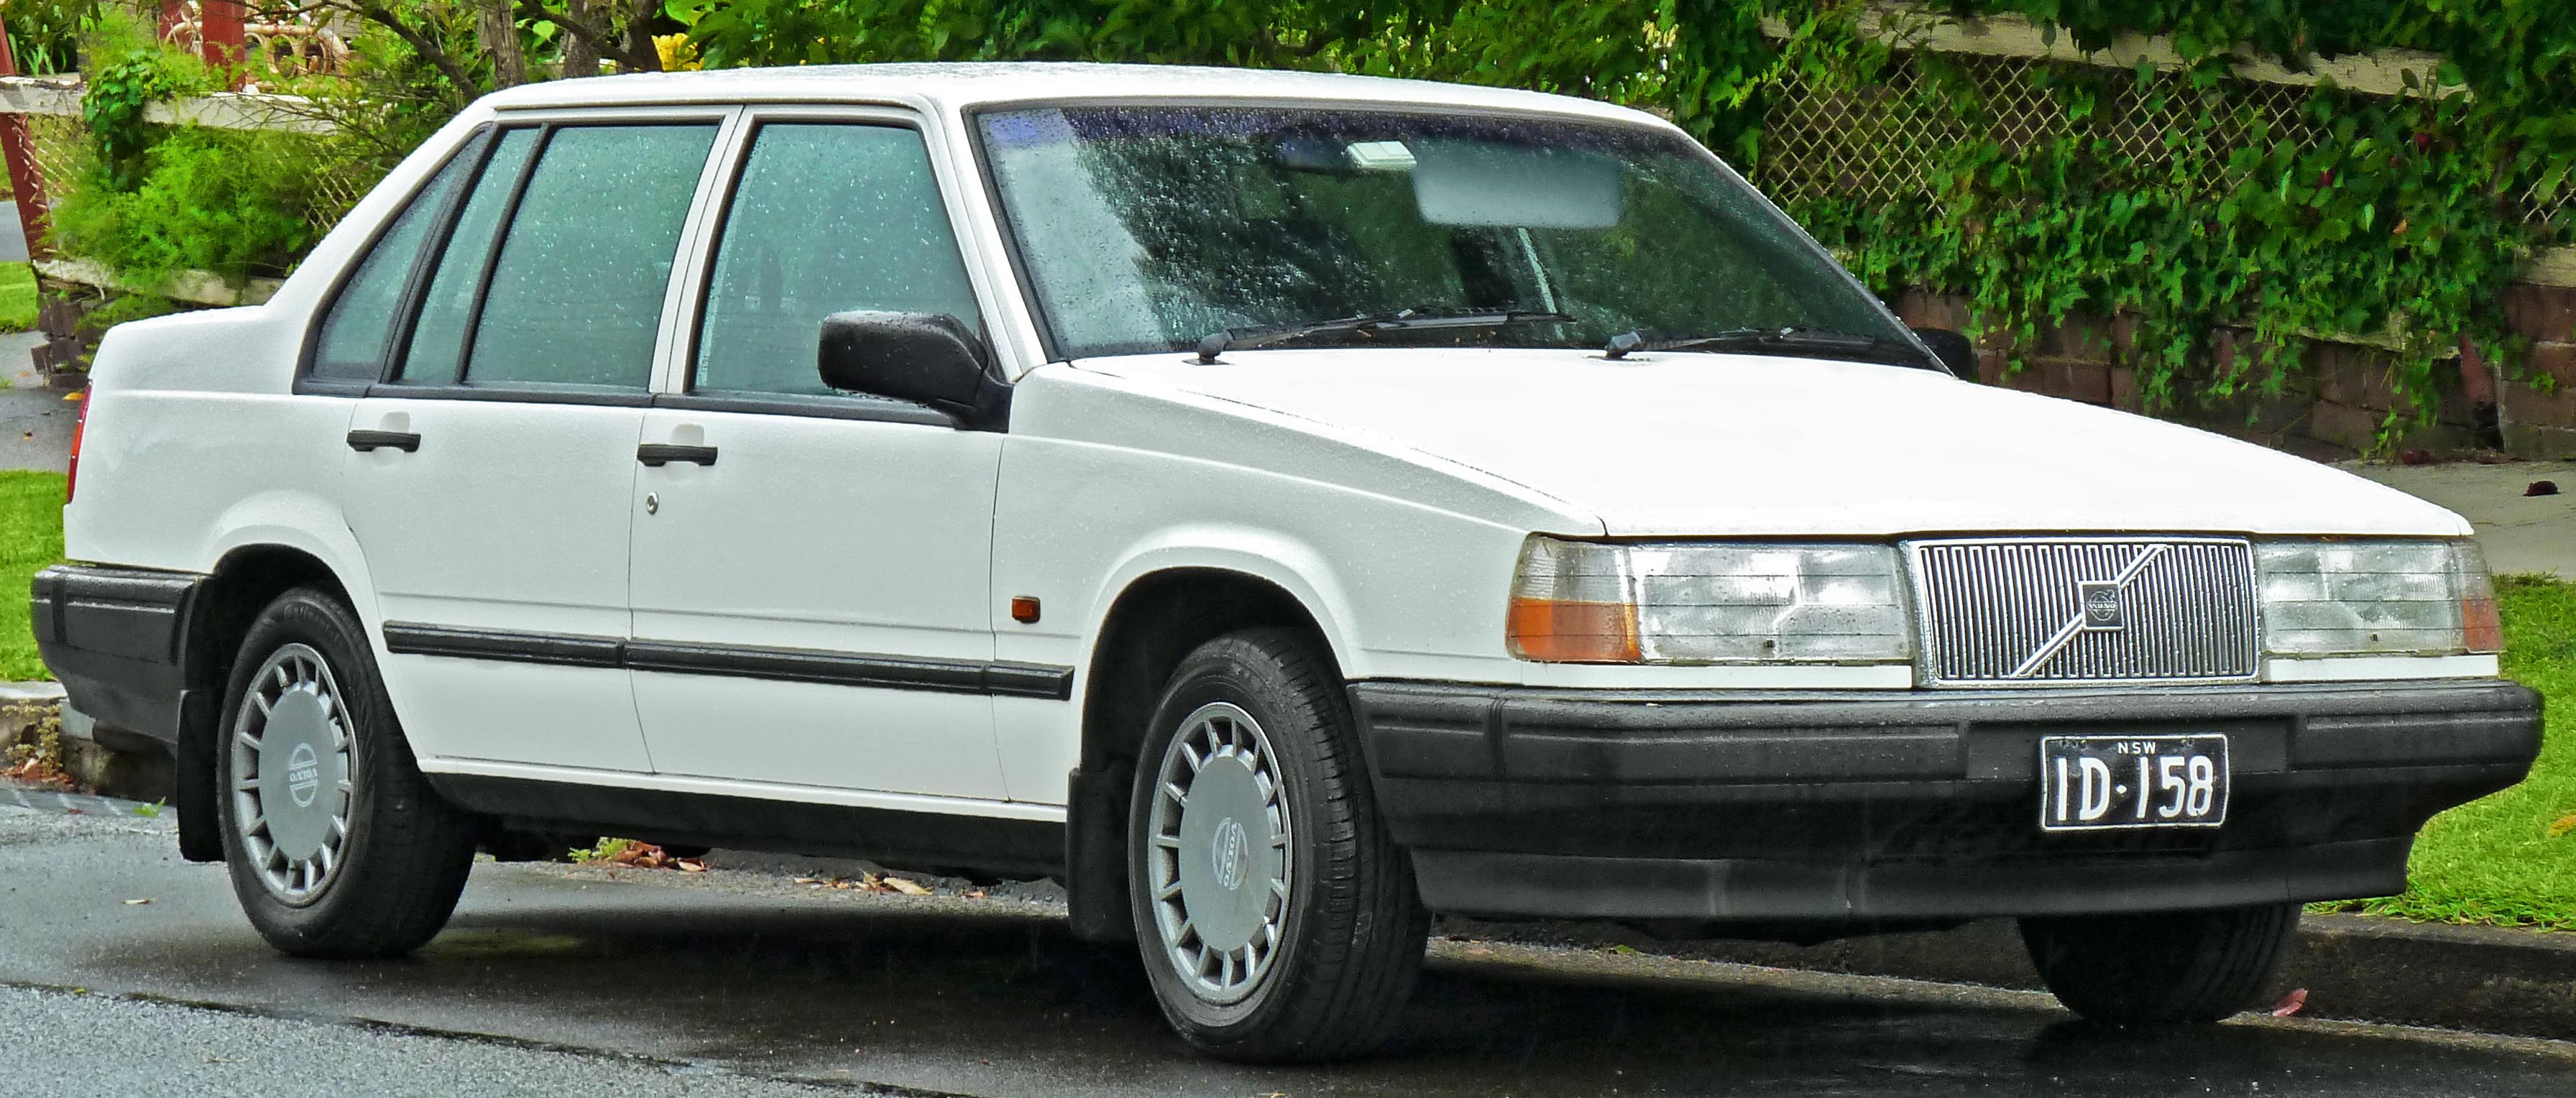 File 1992 Volvo 940 Gl Sedan 2011 10 25 Jpg Wikimedia